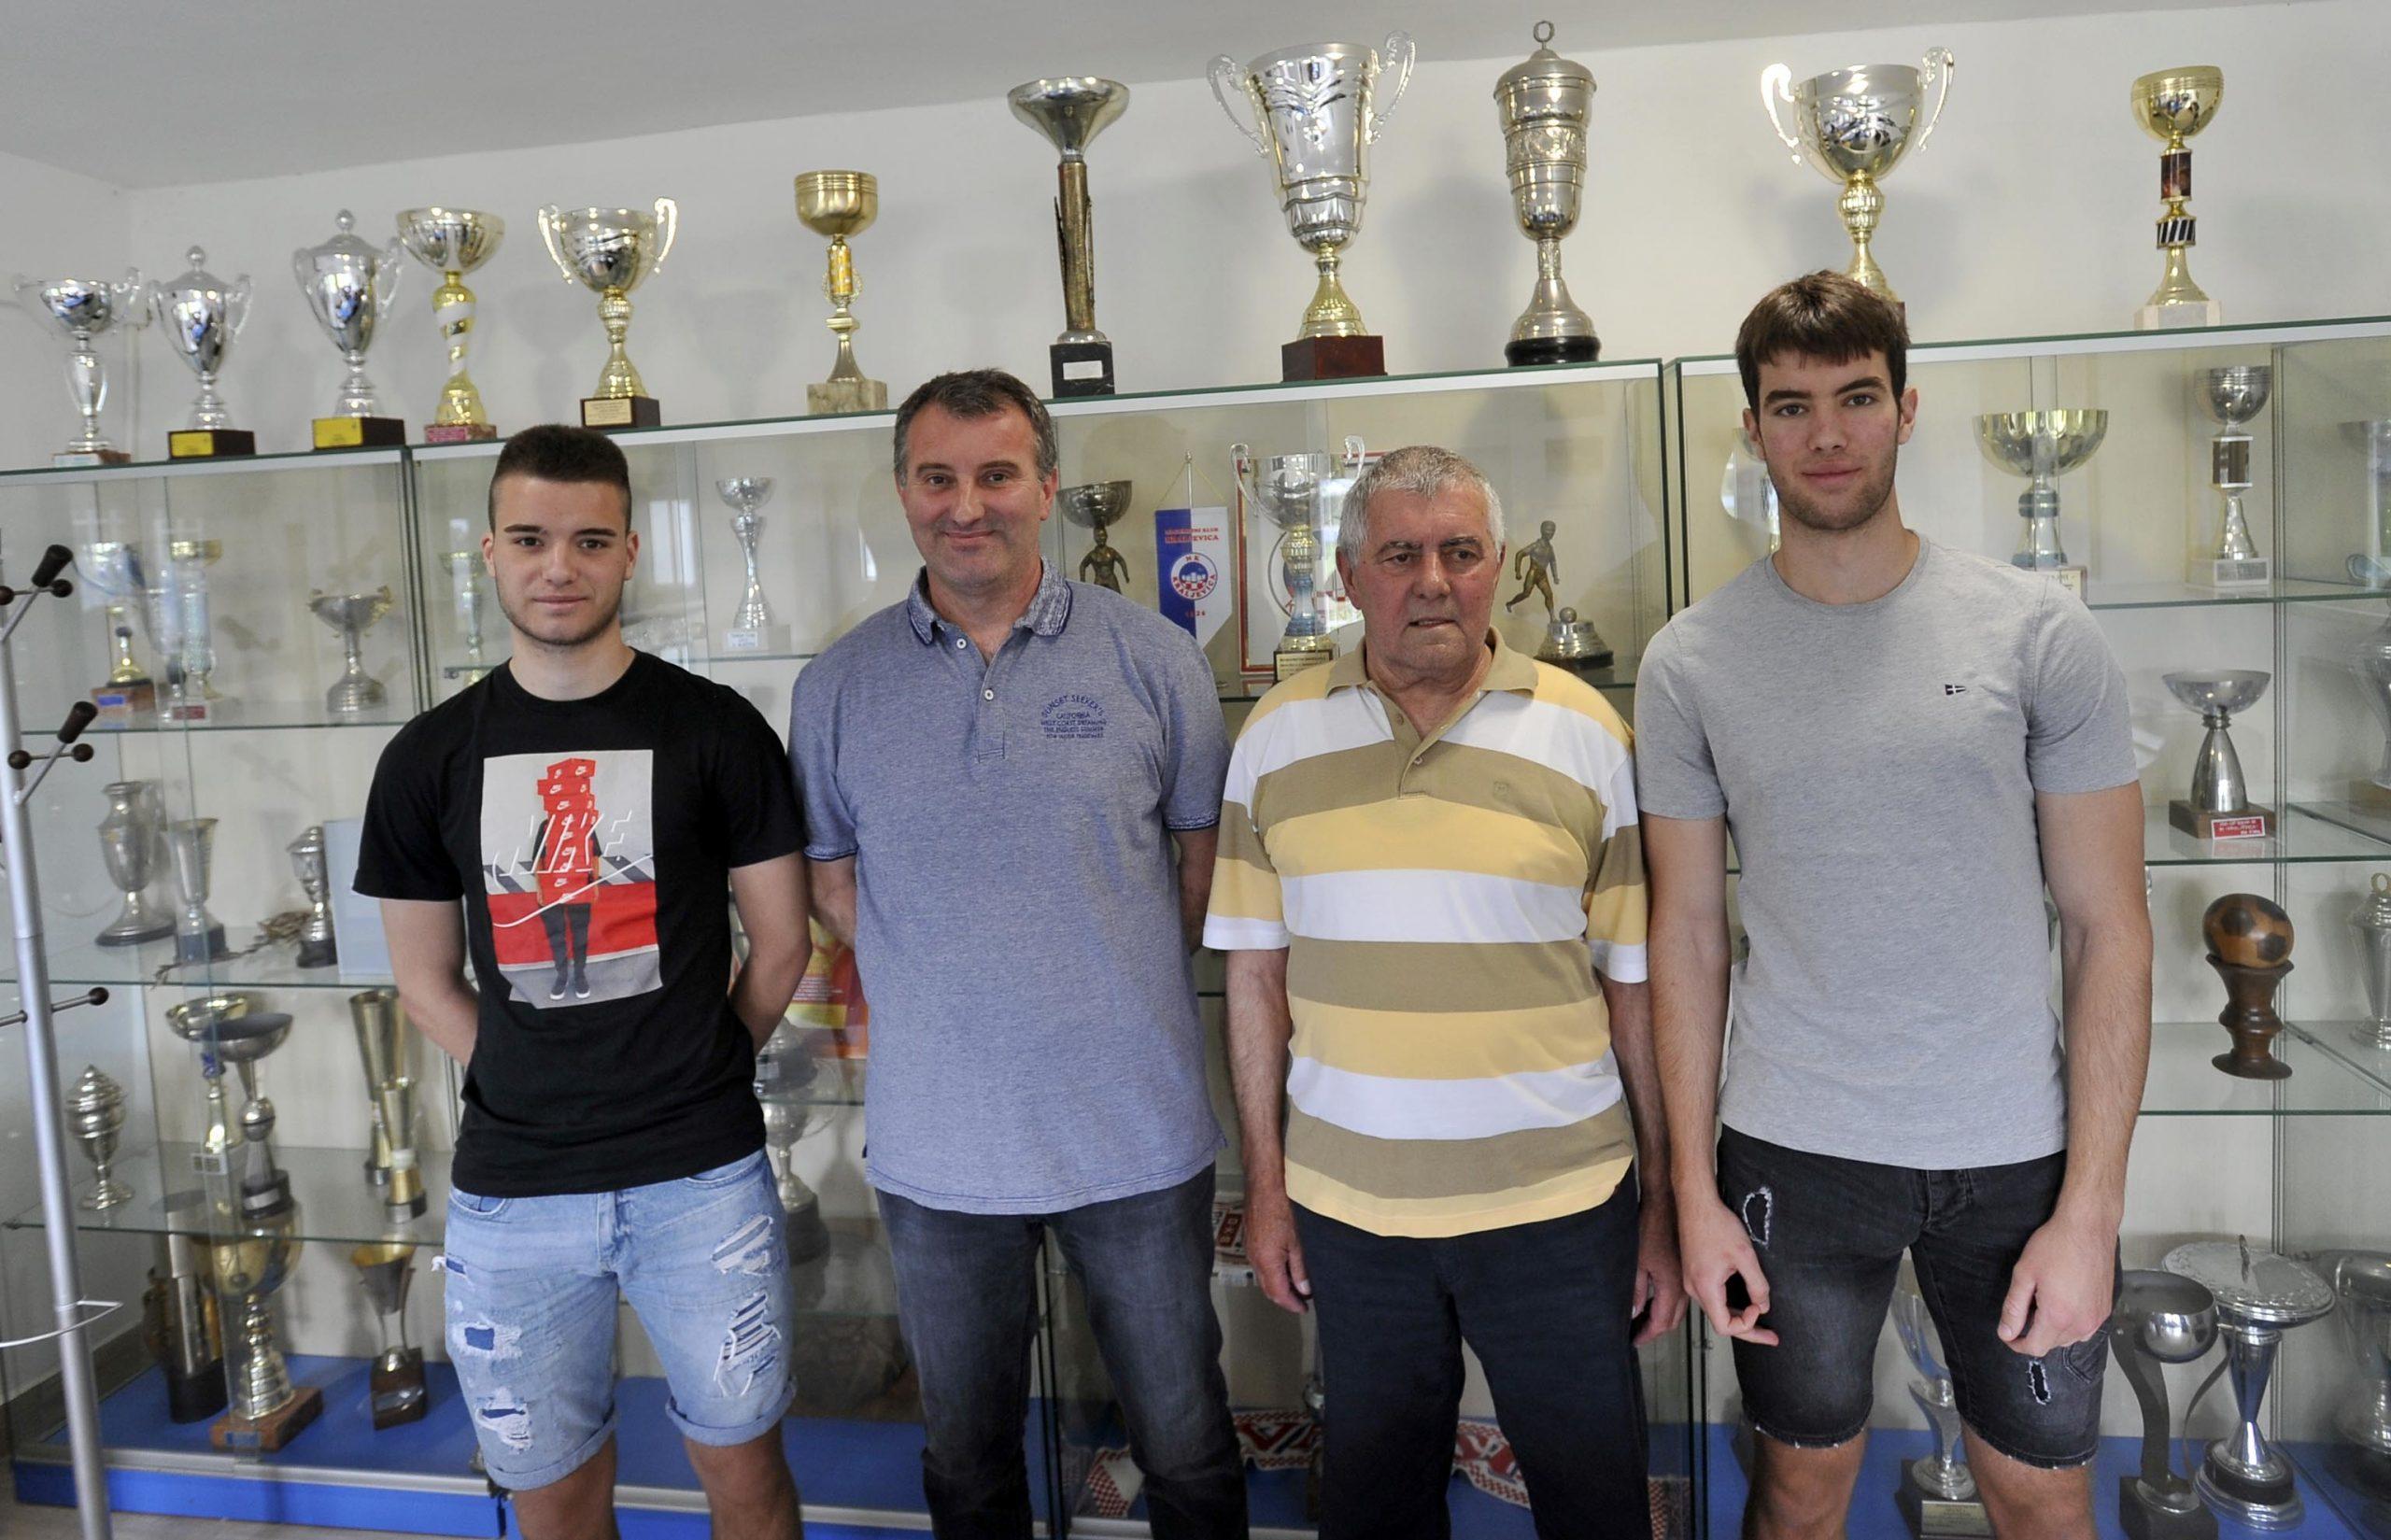 Filip, Bruno, Josip i Borna Znamenaček/D. ŠKOMRLJ